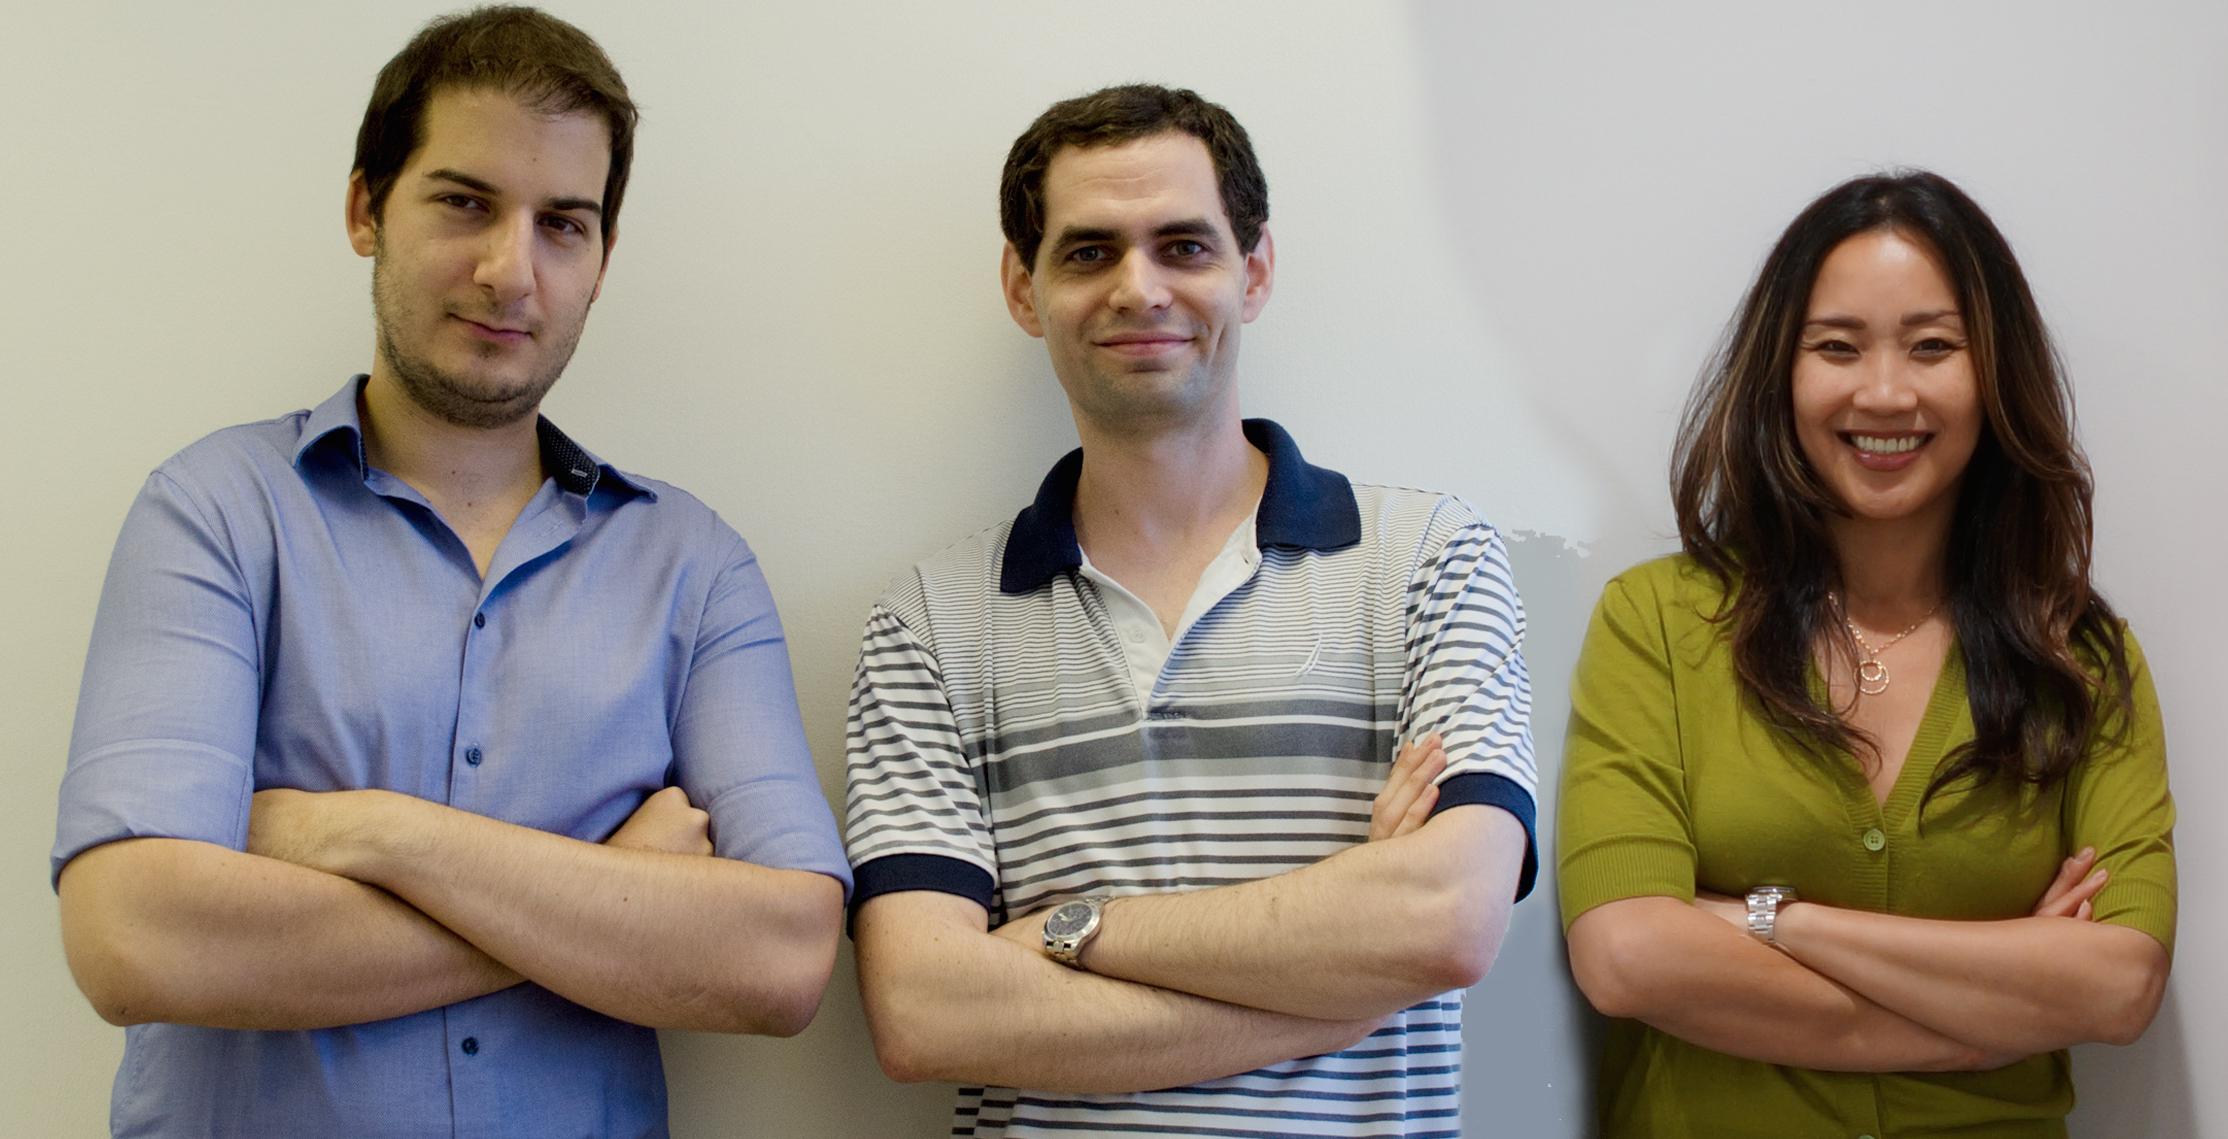 Co-founders: Gadi Elishayov, Eran Friedman, Susan Kuo